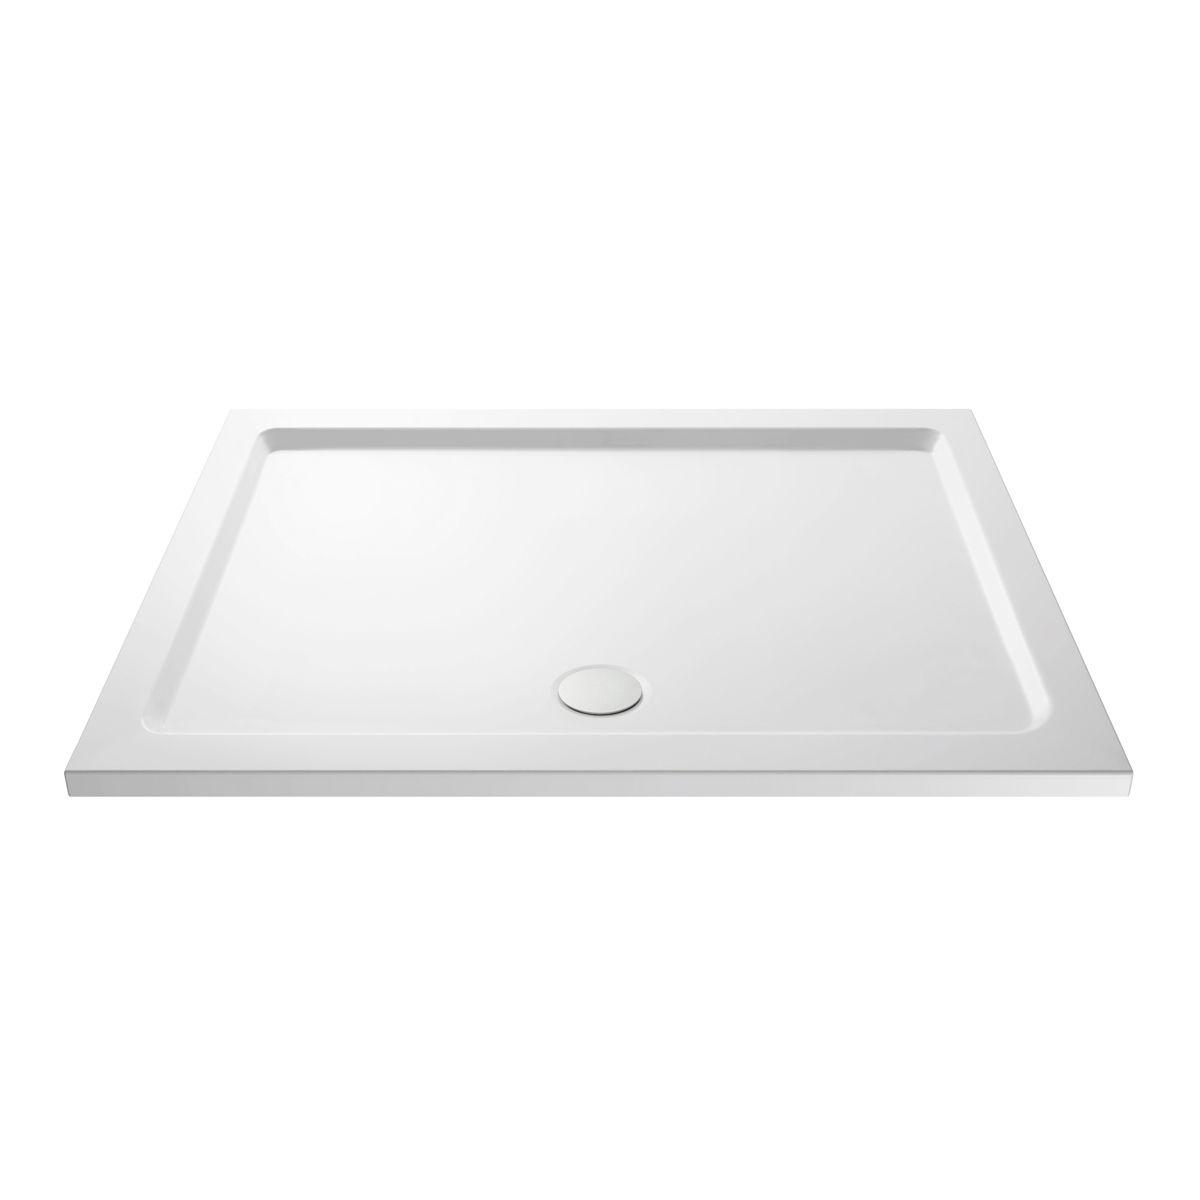 Cassellie Rectangular Shower Tray 1400 x 900mm